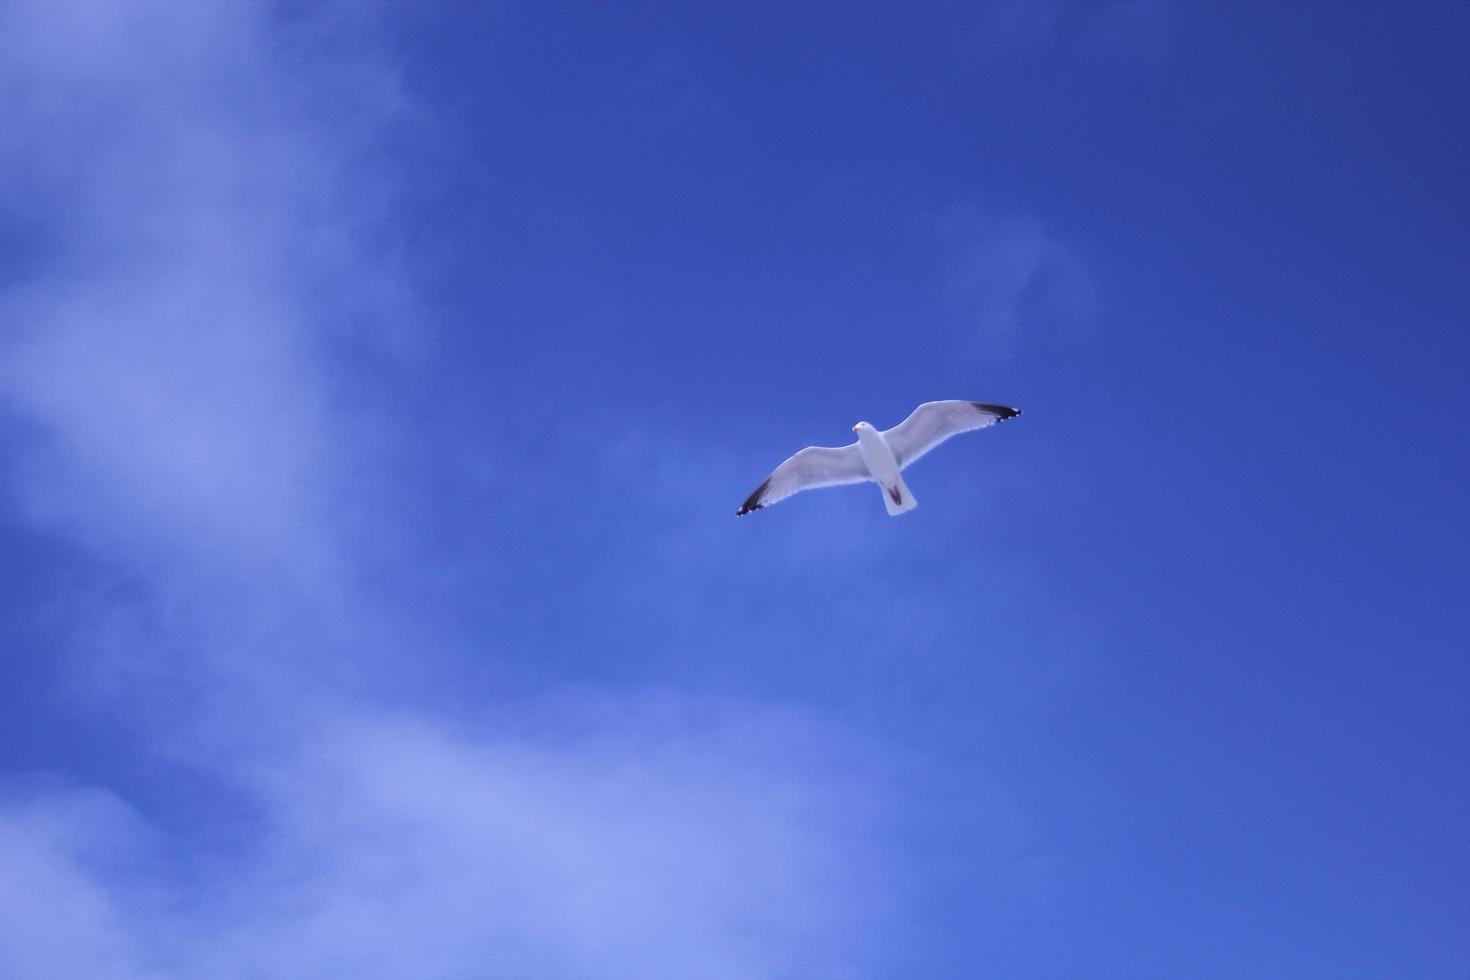 Bird flying against blue sky photo